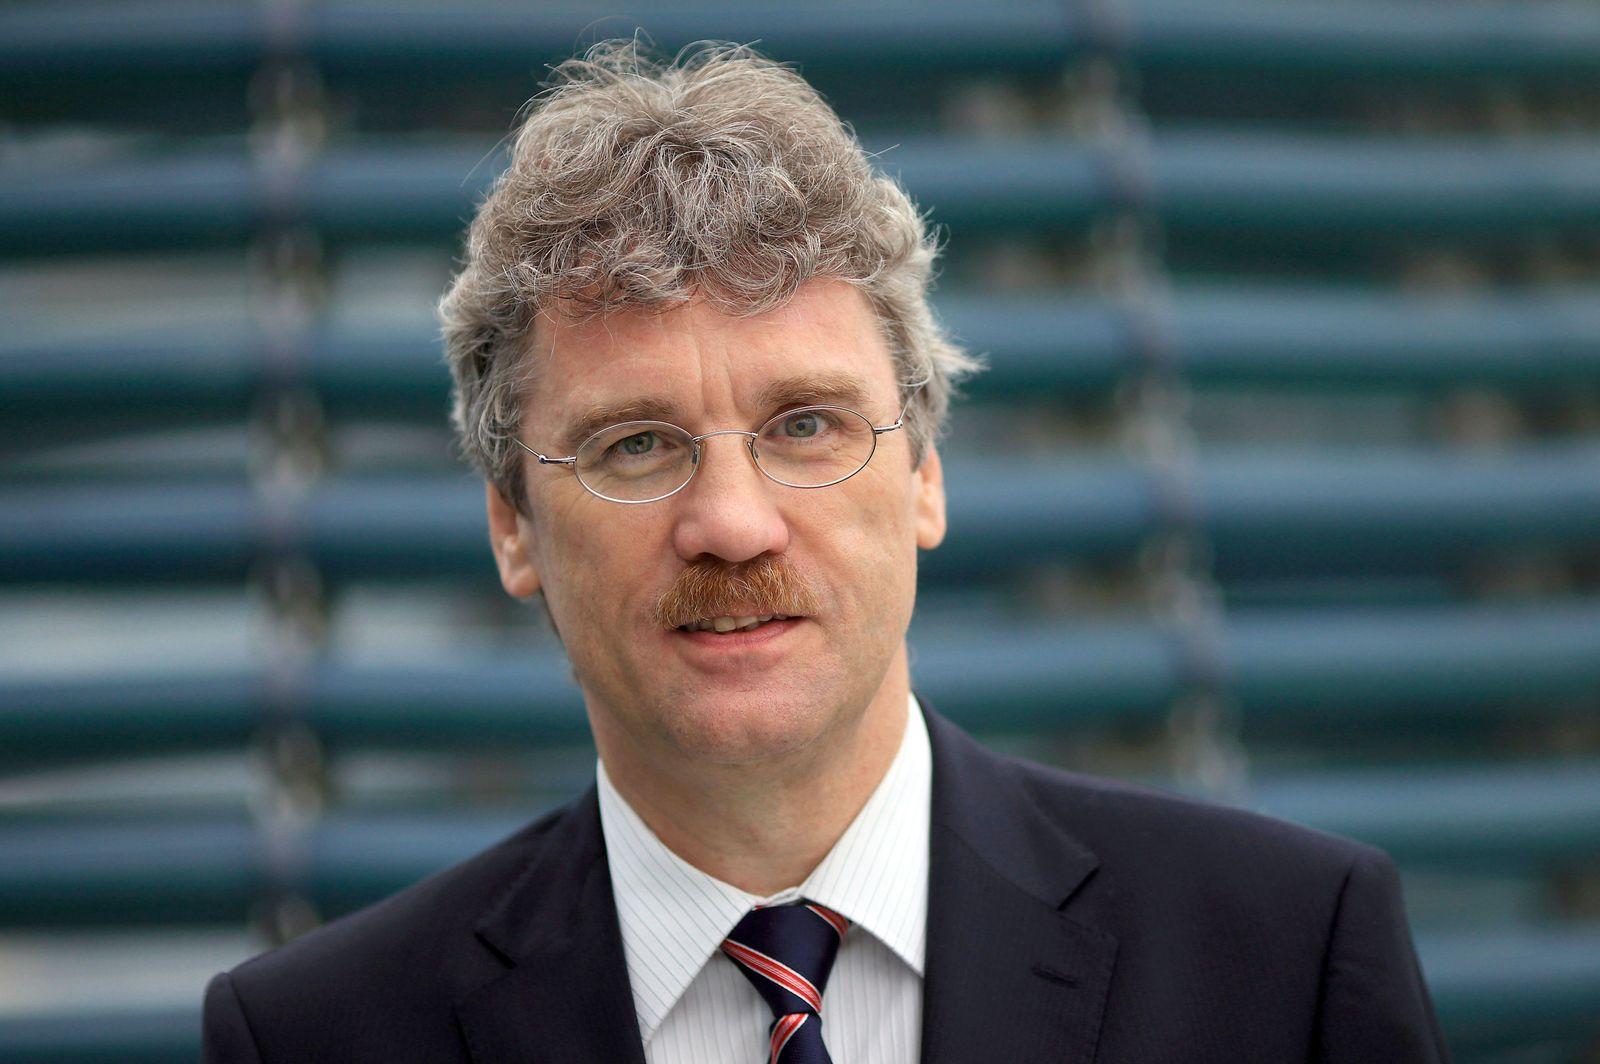 Jochen Großmann BER Hauptstadtflughafen Technikchef